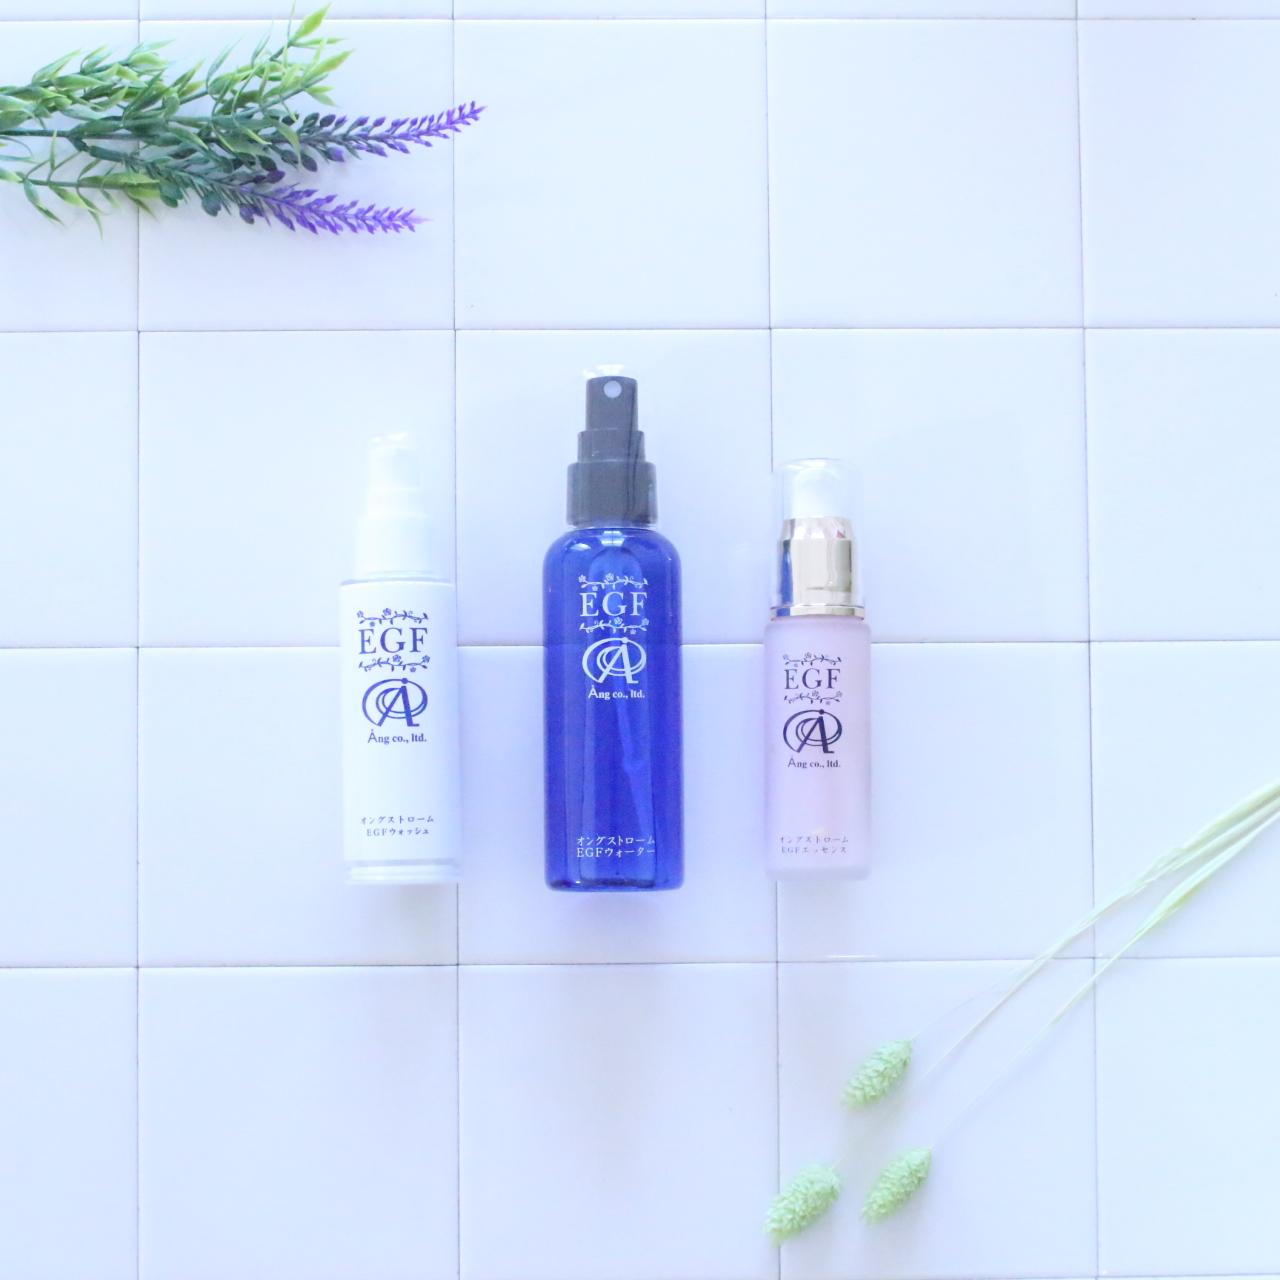 Salon Kyoko Skincare Store 金箔基礎化粧品ショップ